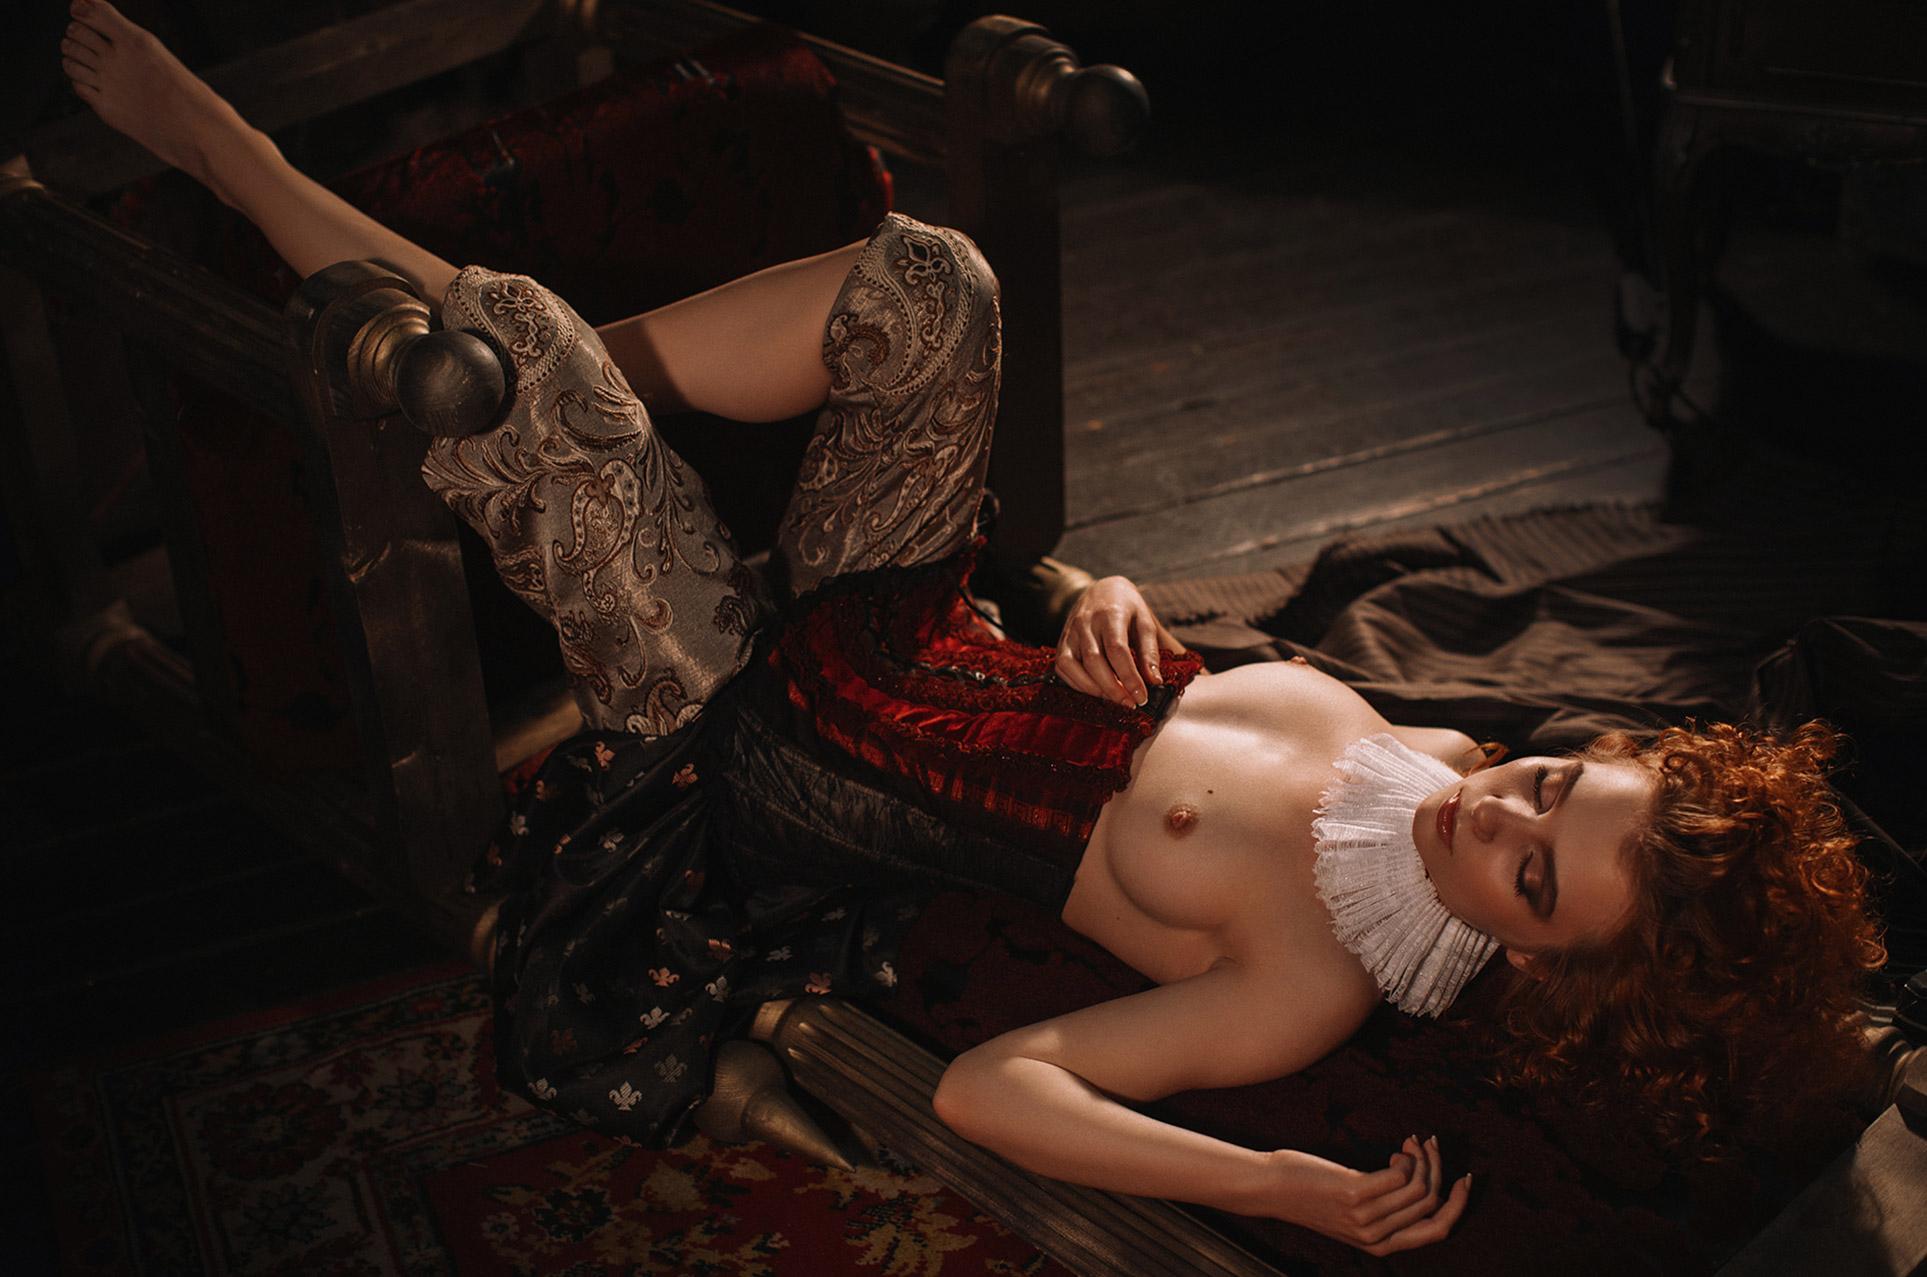 Голая Марта Громова примеряет сапожки и шляпки / Marta Gromova by Roman Tretyakov